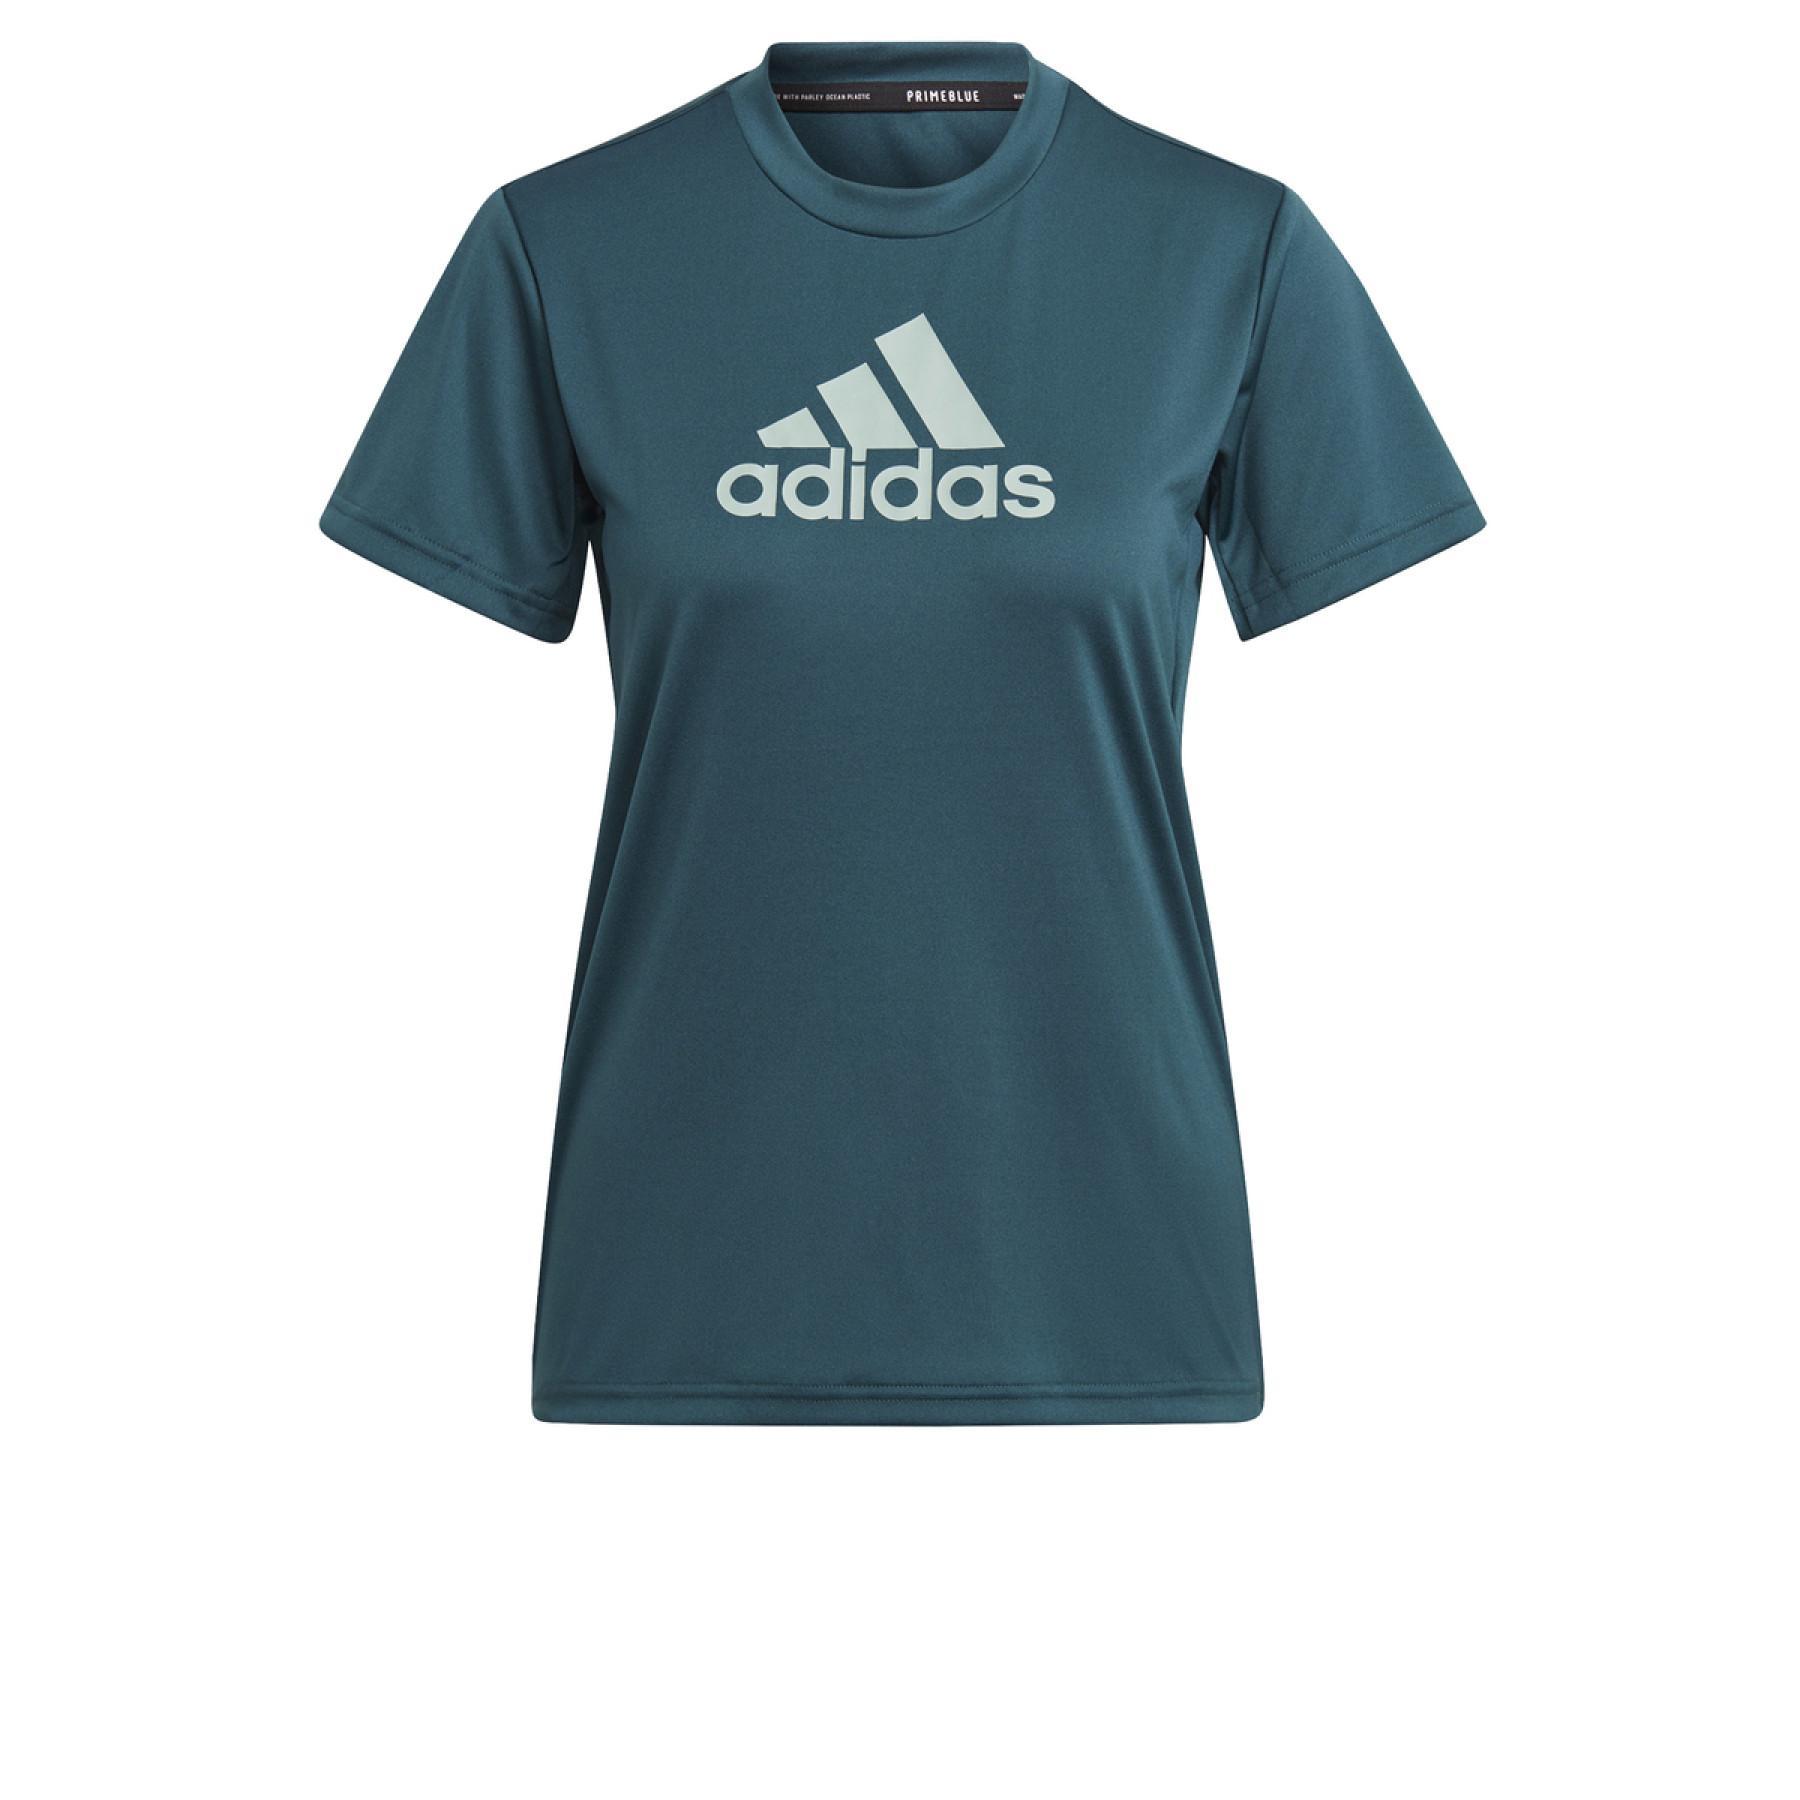 adidas Women's T-Shirt Primeblue Designed 2 Move Sport Logo